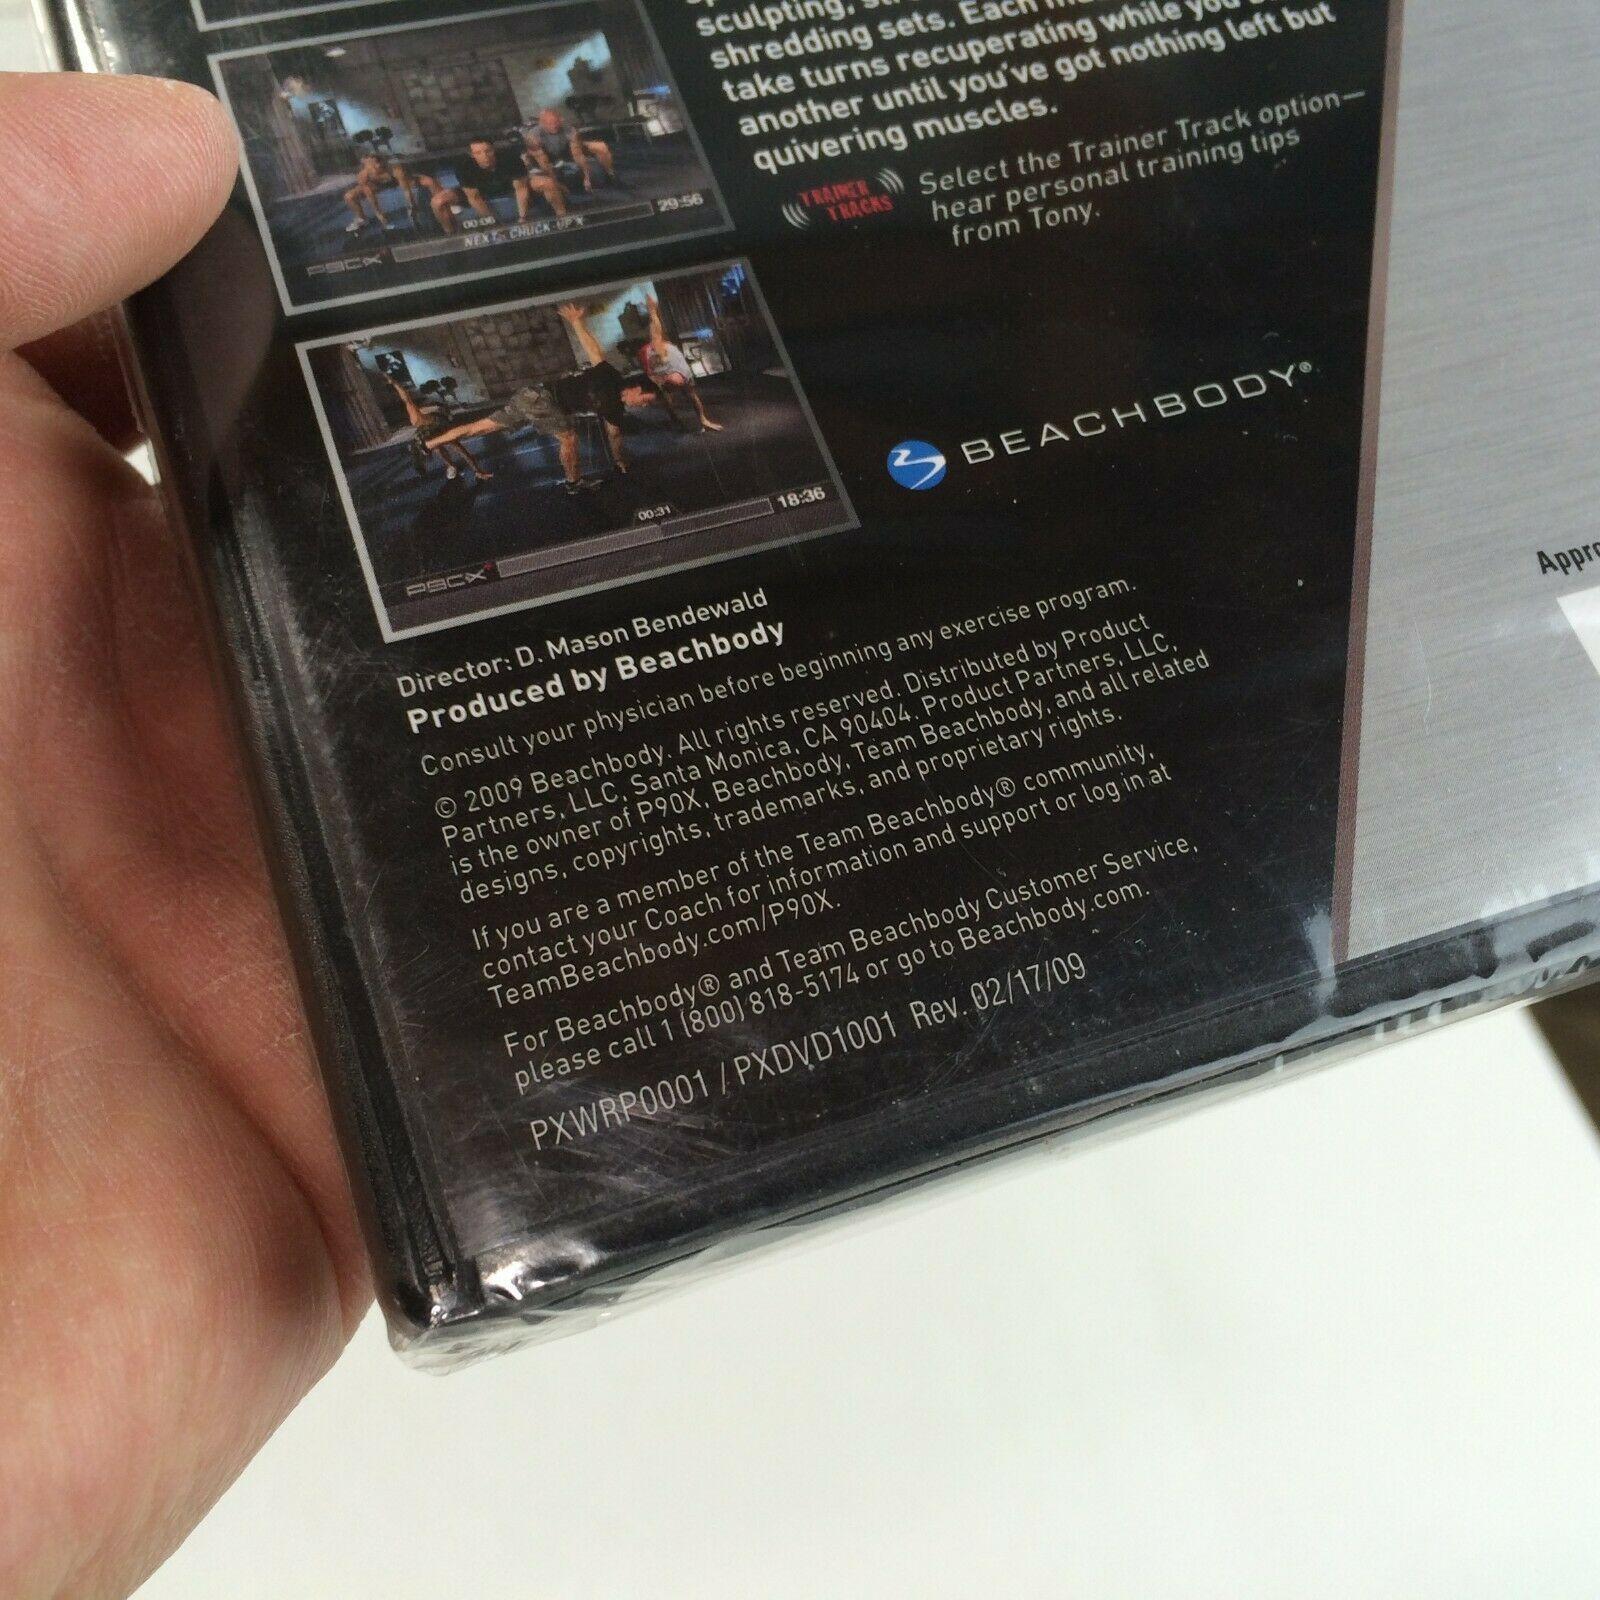 BEACHBODY P90X+ Extreme Home Fitness Total Body Plus with Tony Horton DVD NEW image 4